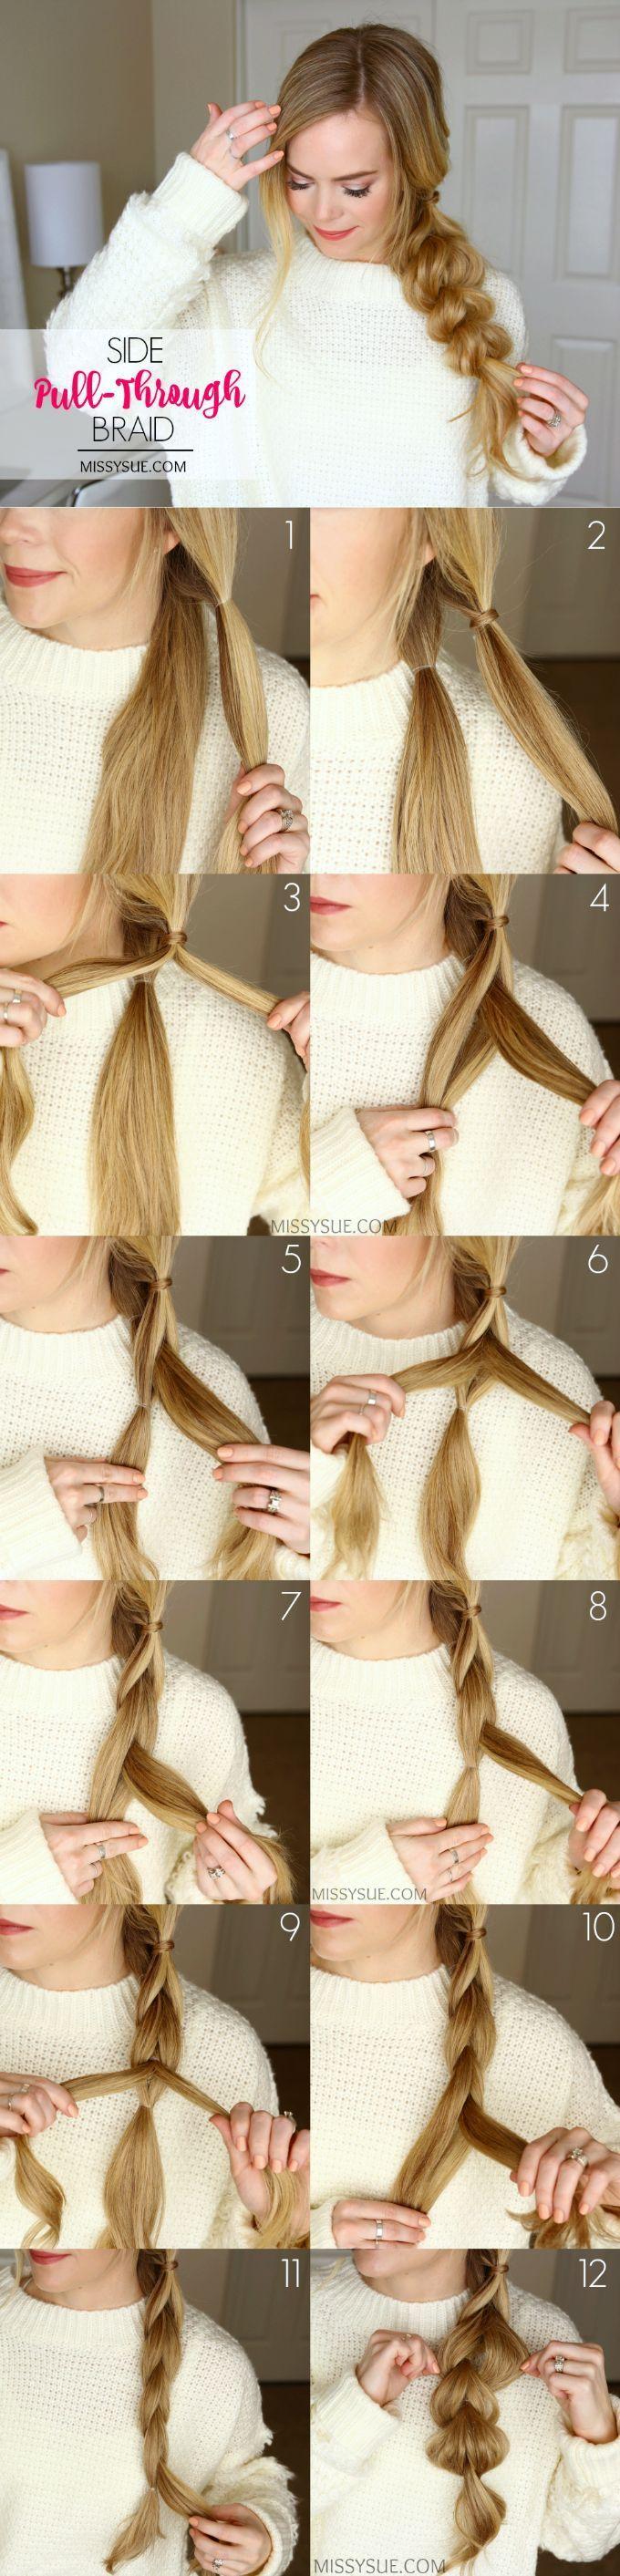 Lovely Cute Einfach Frisuren zu tun